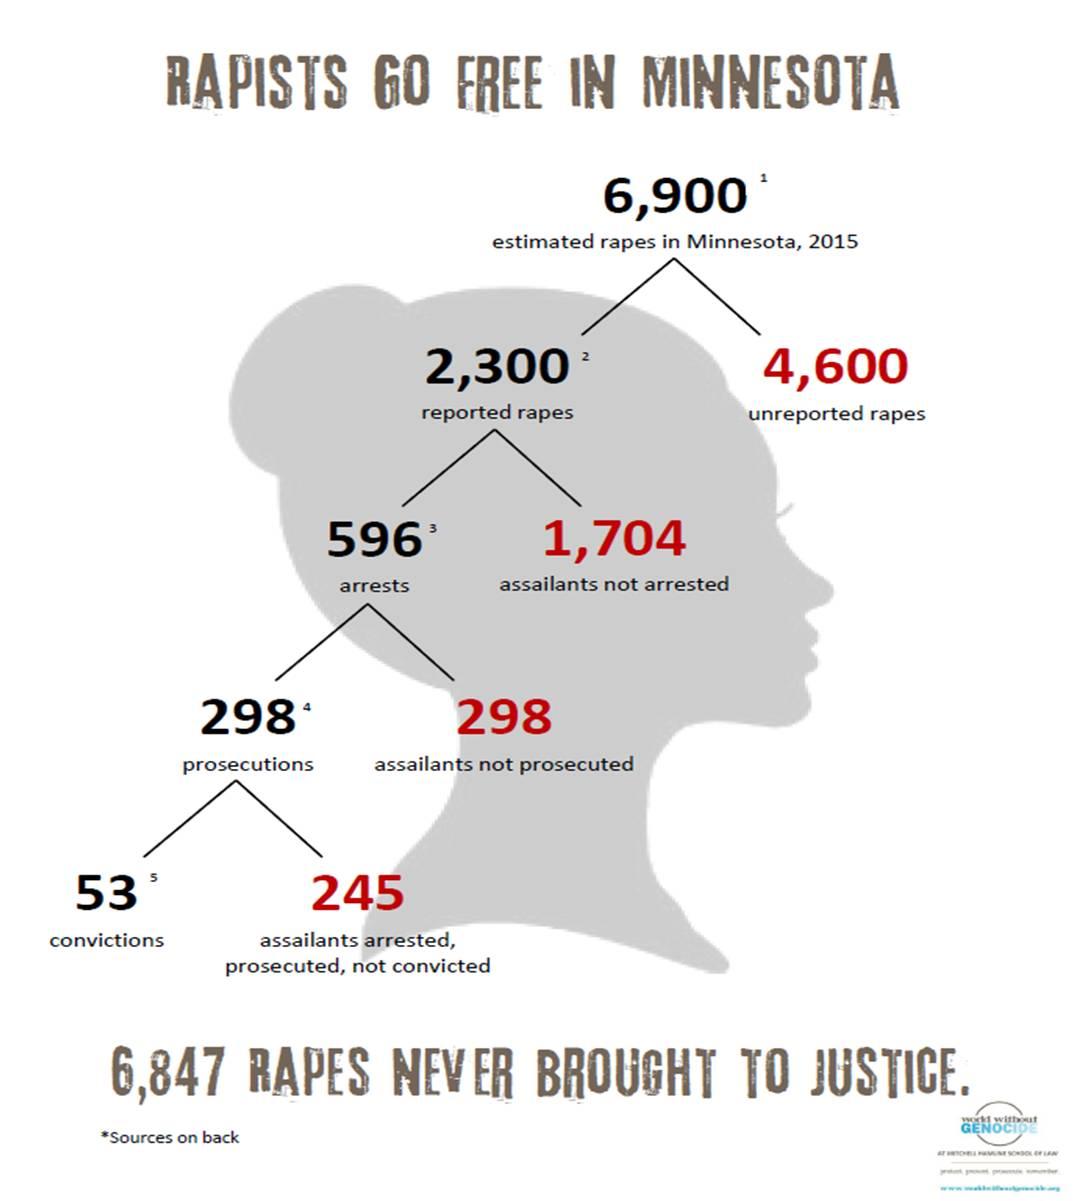 rapists-go-free